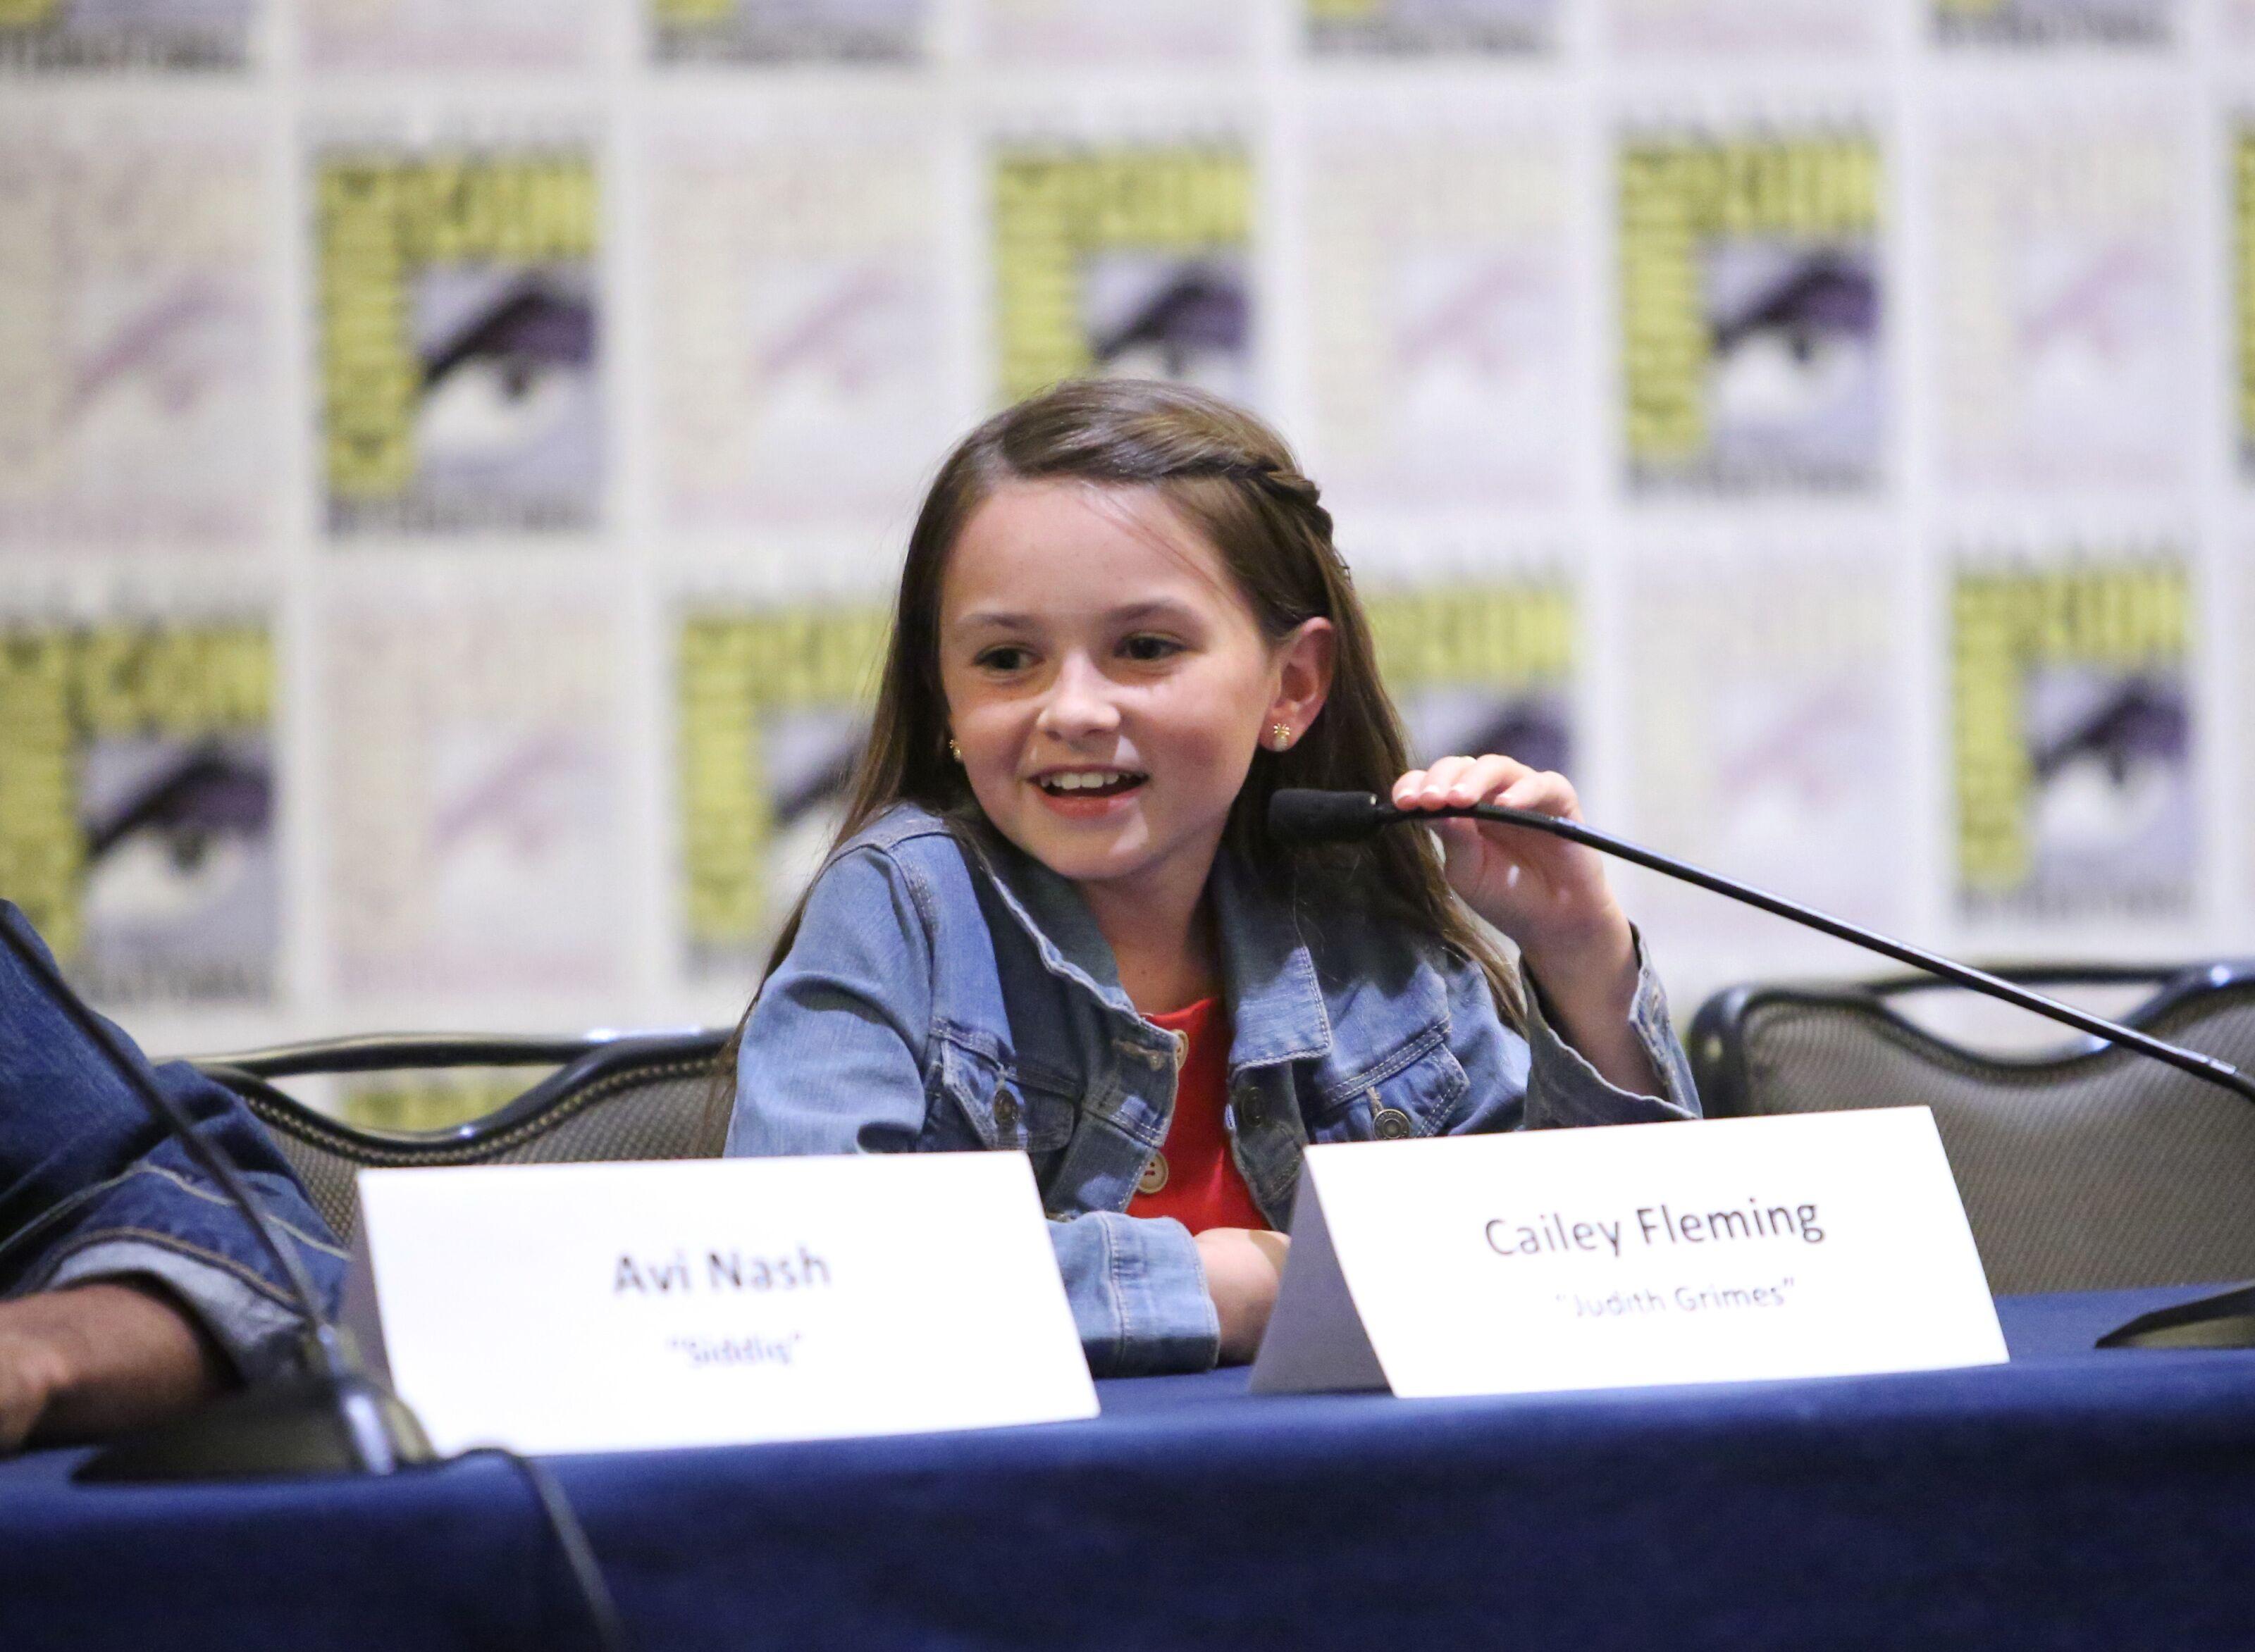 Watch: The Walking Dead star Cailey Fleming flips over Judith Funko Pop